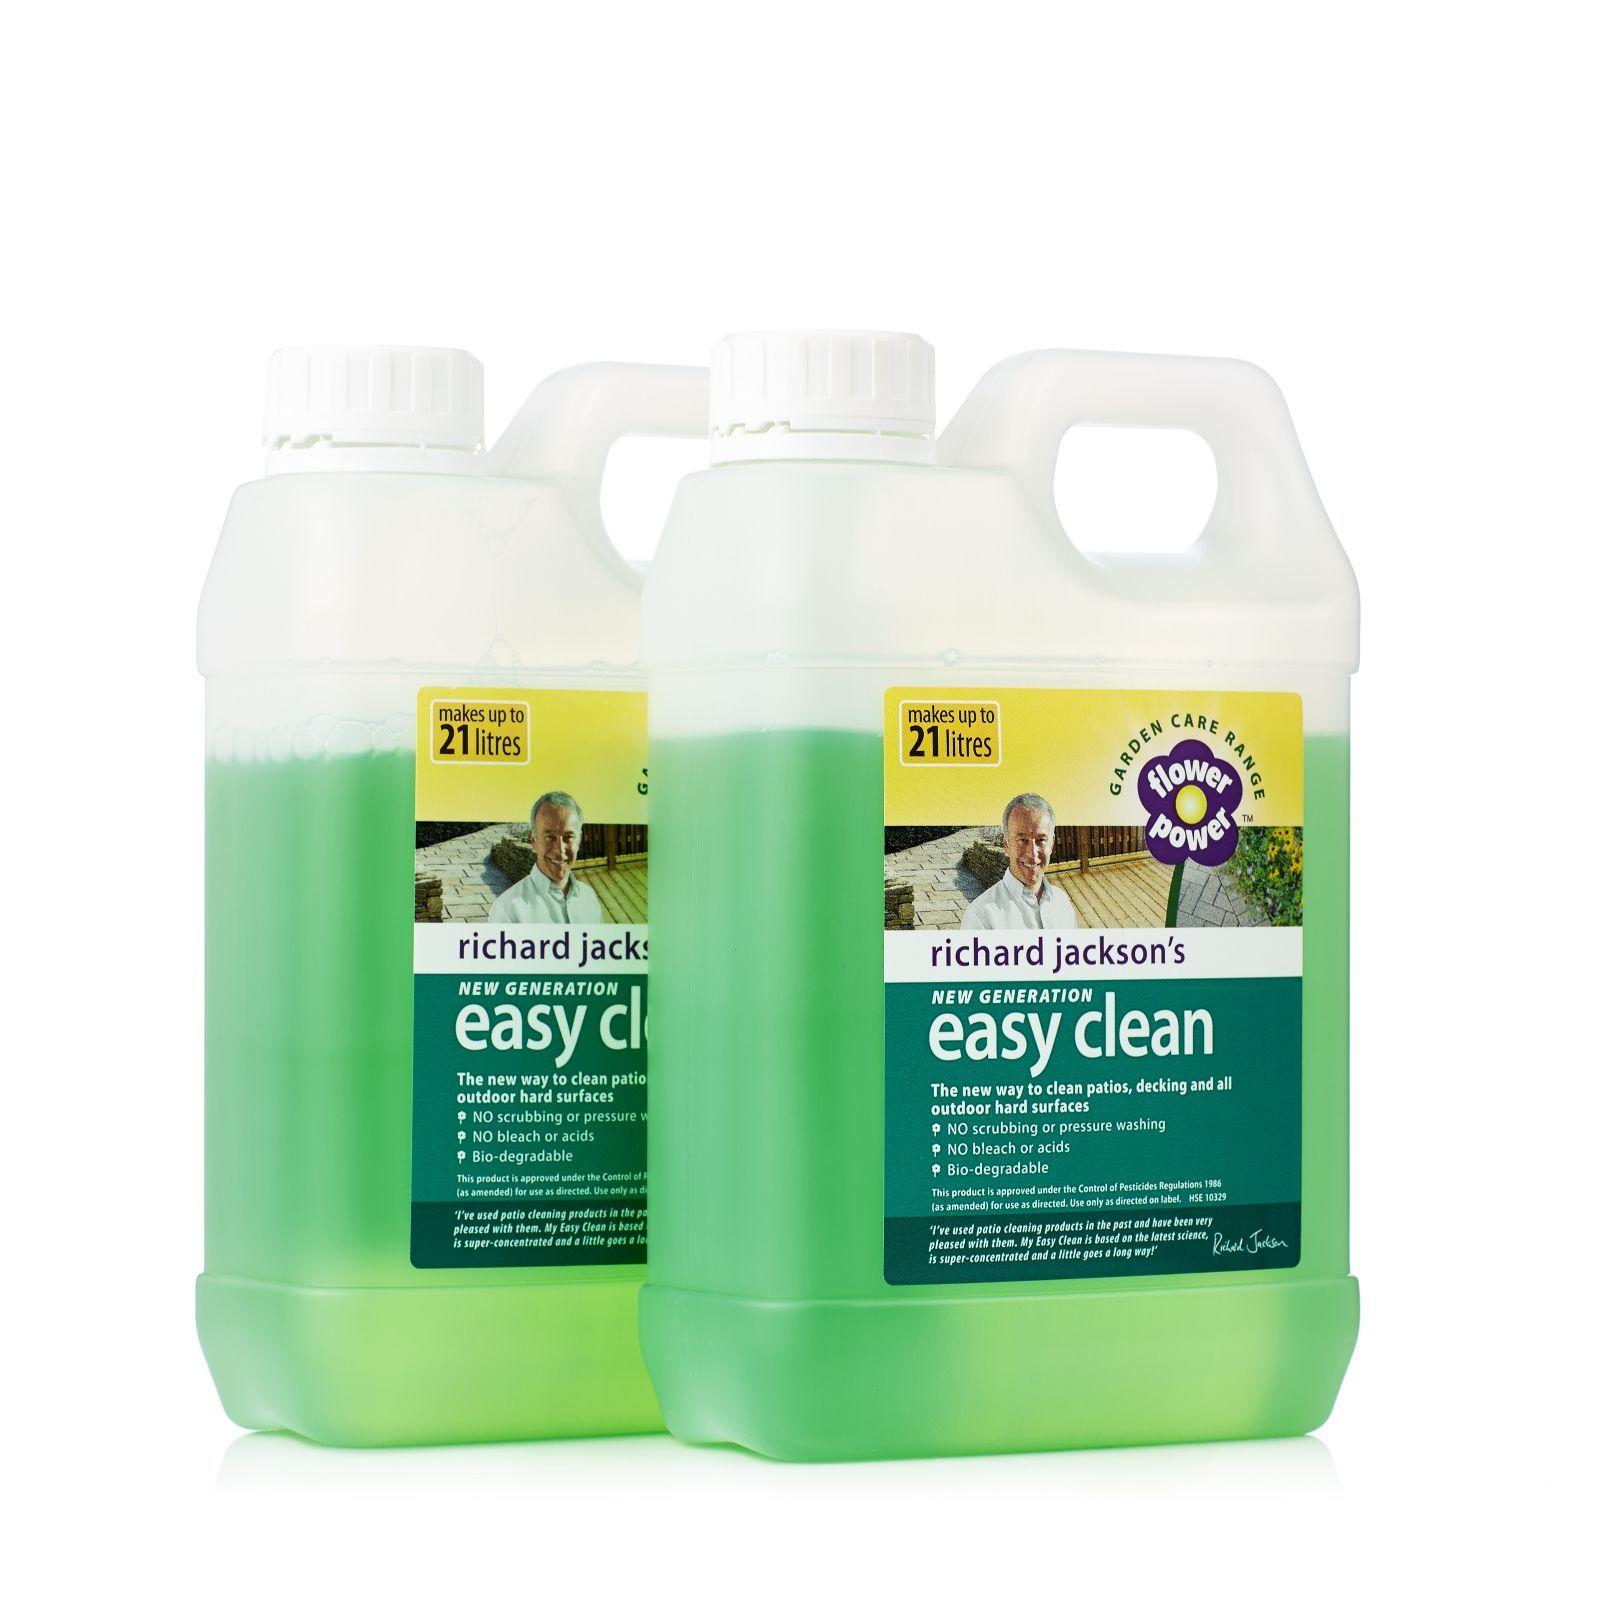 QVCUK TSV OFFER 11/03/17 508800   Richard Jacksonu0027s Easy Clean 2x 1L